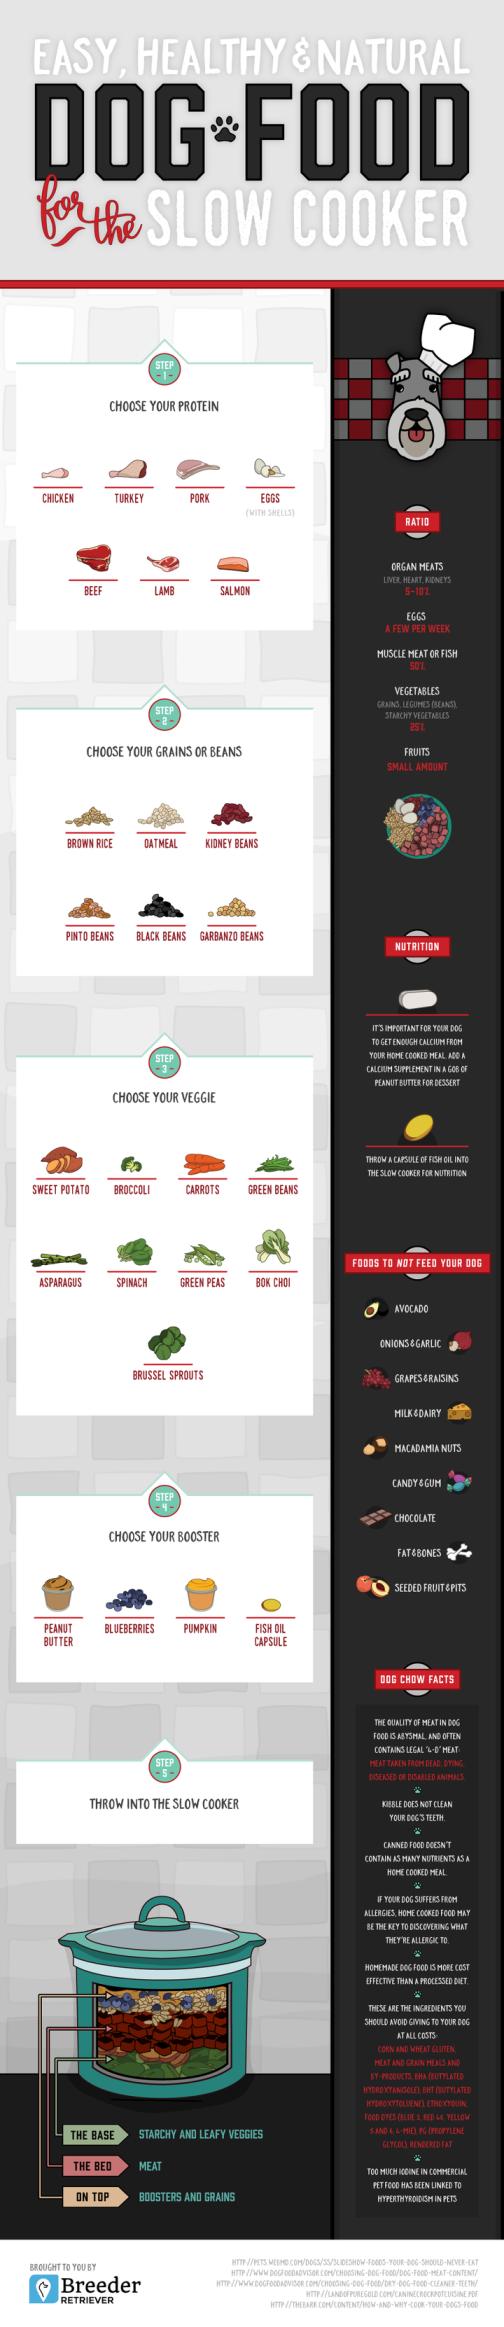 how to make dog food chart